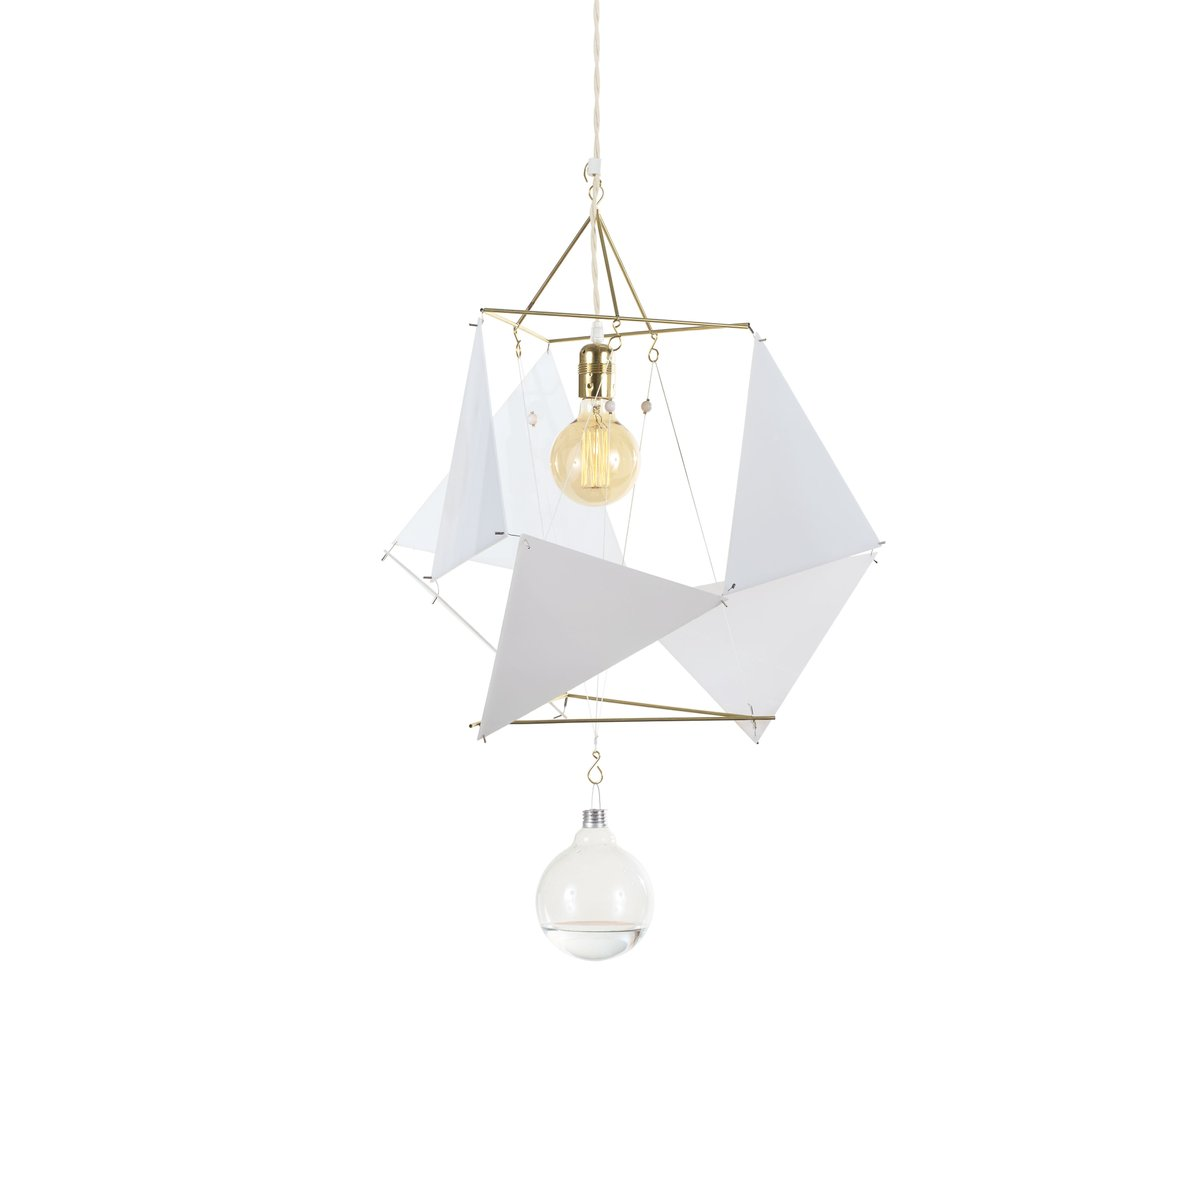 Modulare Vector Equilibrium PMMA Lampe von Nicolas Brevers für Gobo Li...